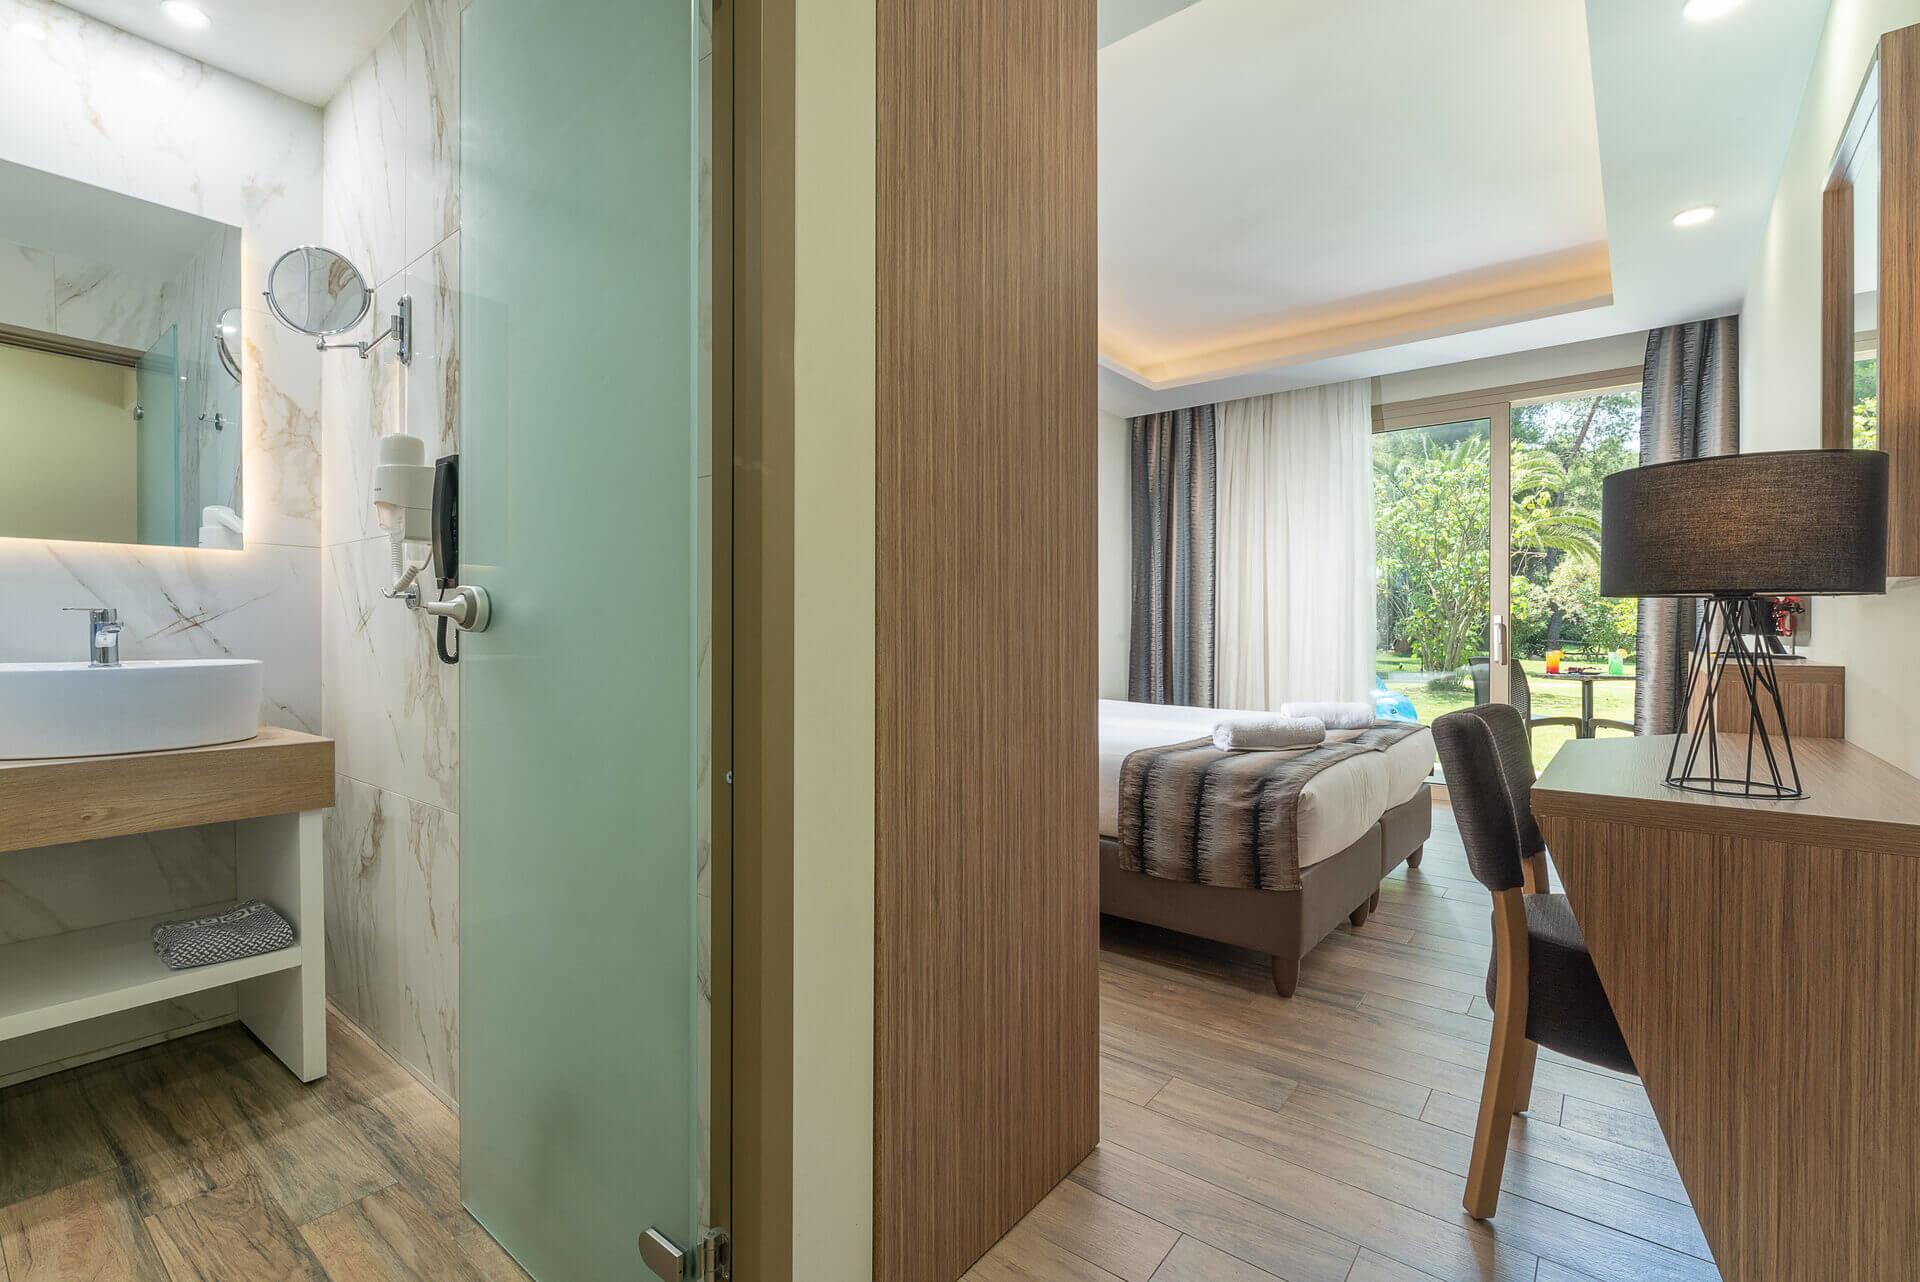 Poseidon Hotel Sea Resort - стая и баня